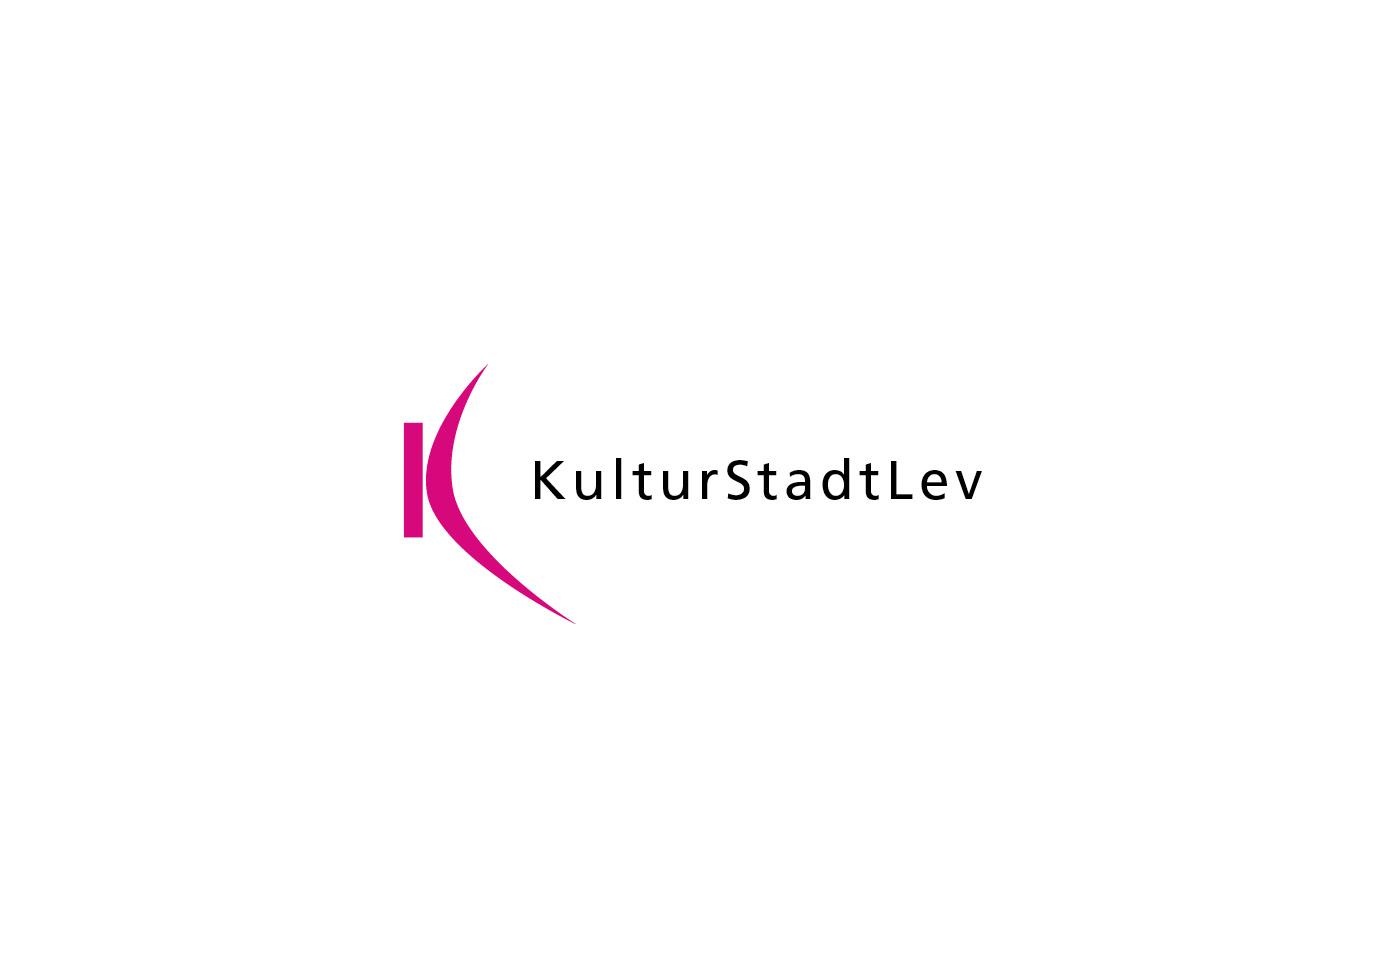 KulturStadtLev